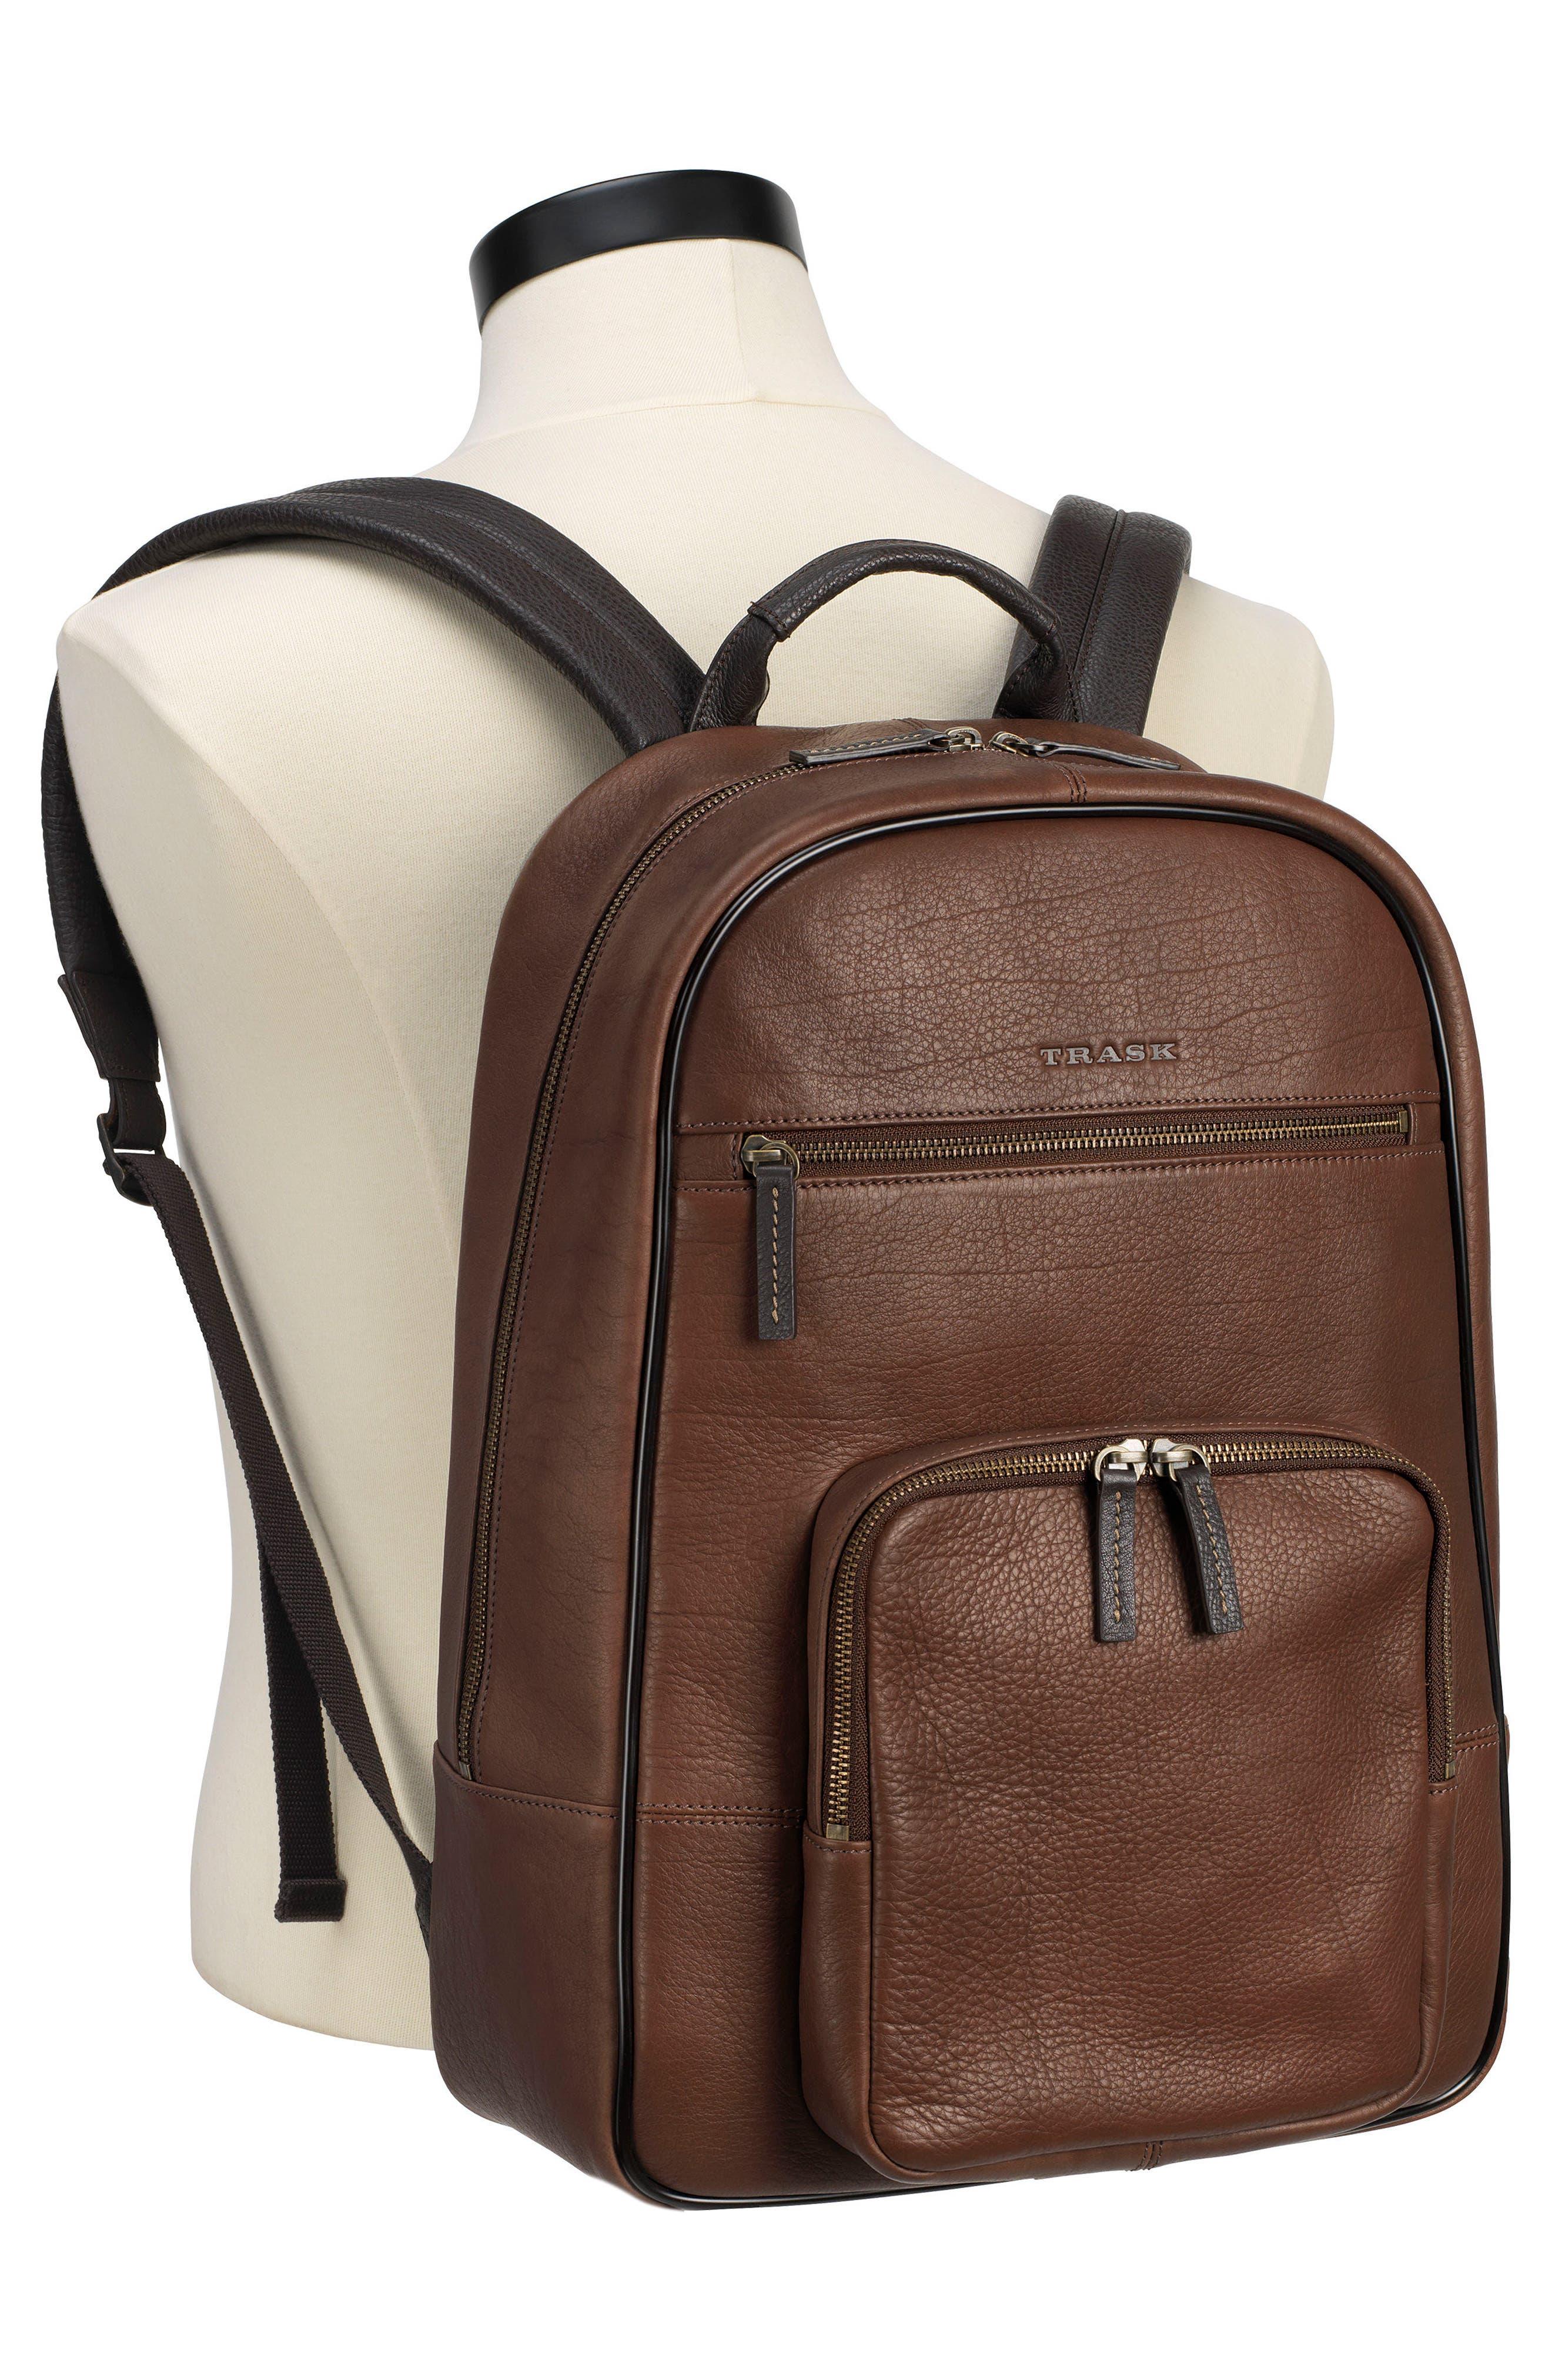 Jackson Backpack,                             Alternate thumbnail 2, color,                             200